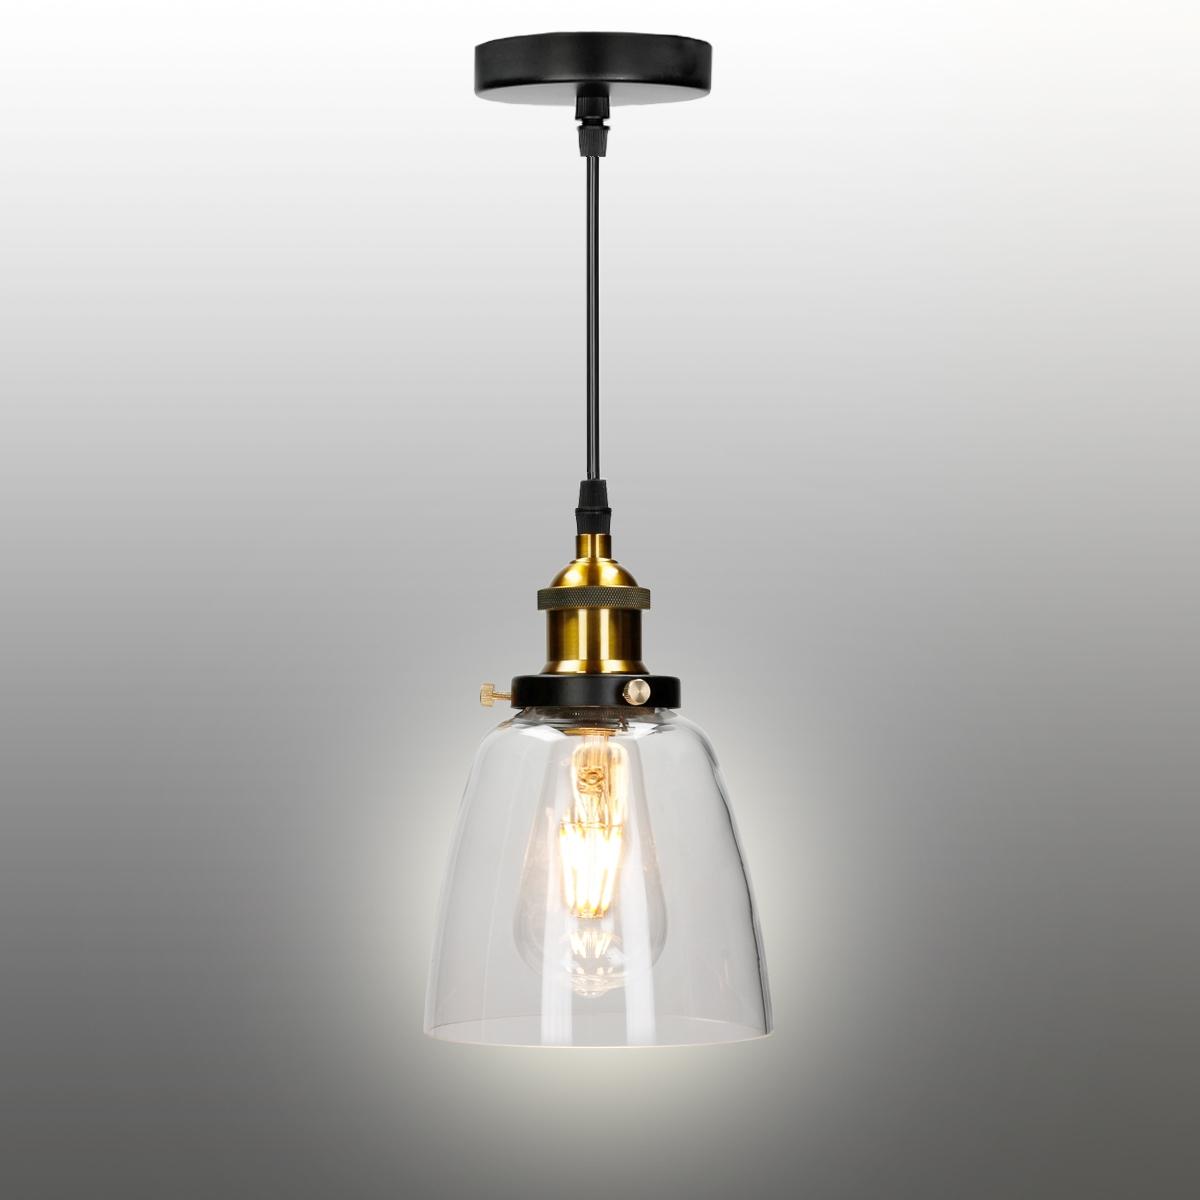 Vintage Retro Hanging Lamp Pendant Lamp Ceiling Light Lamp